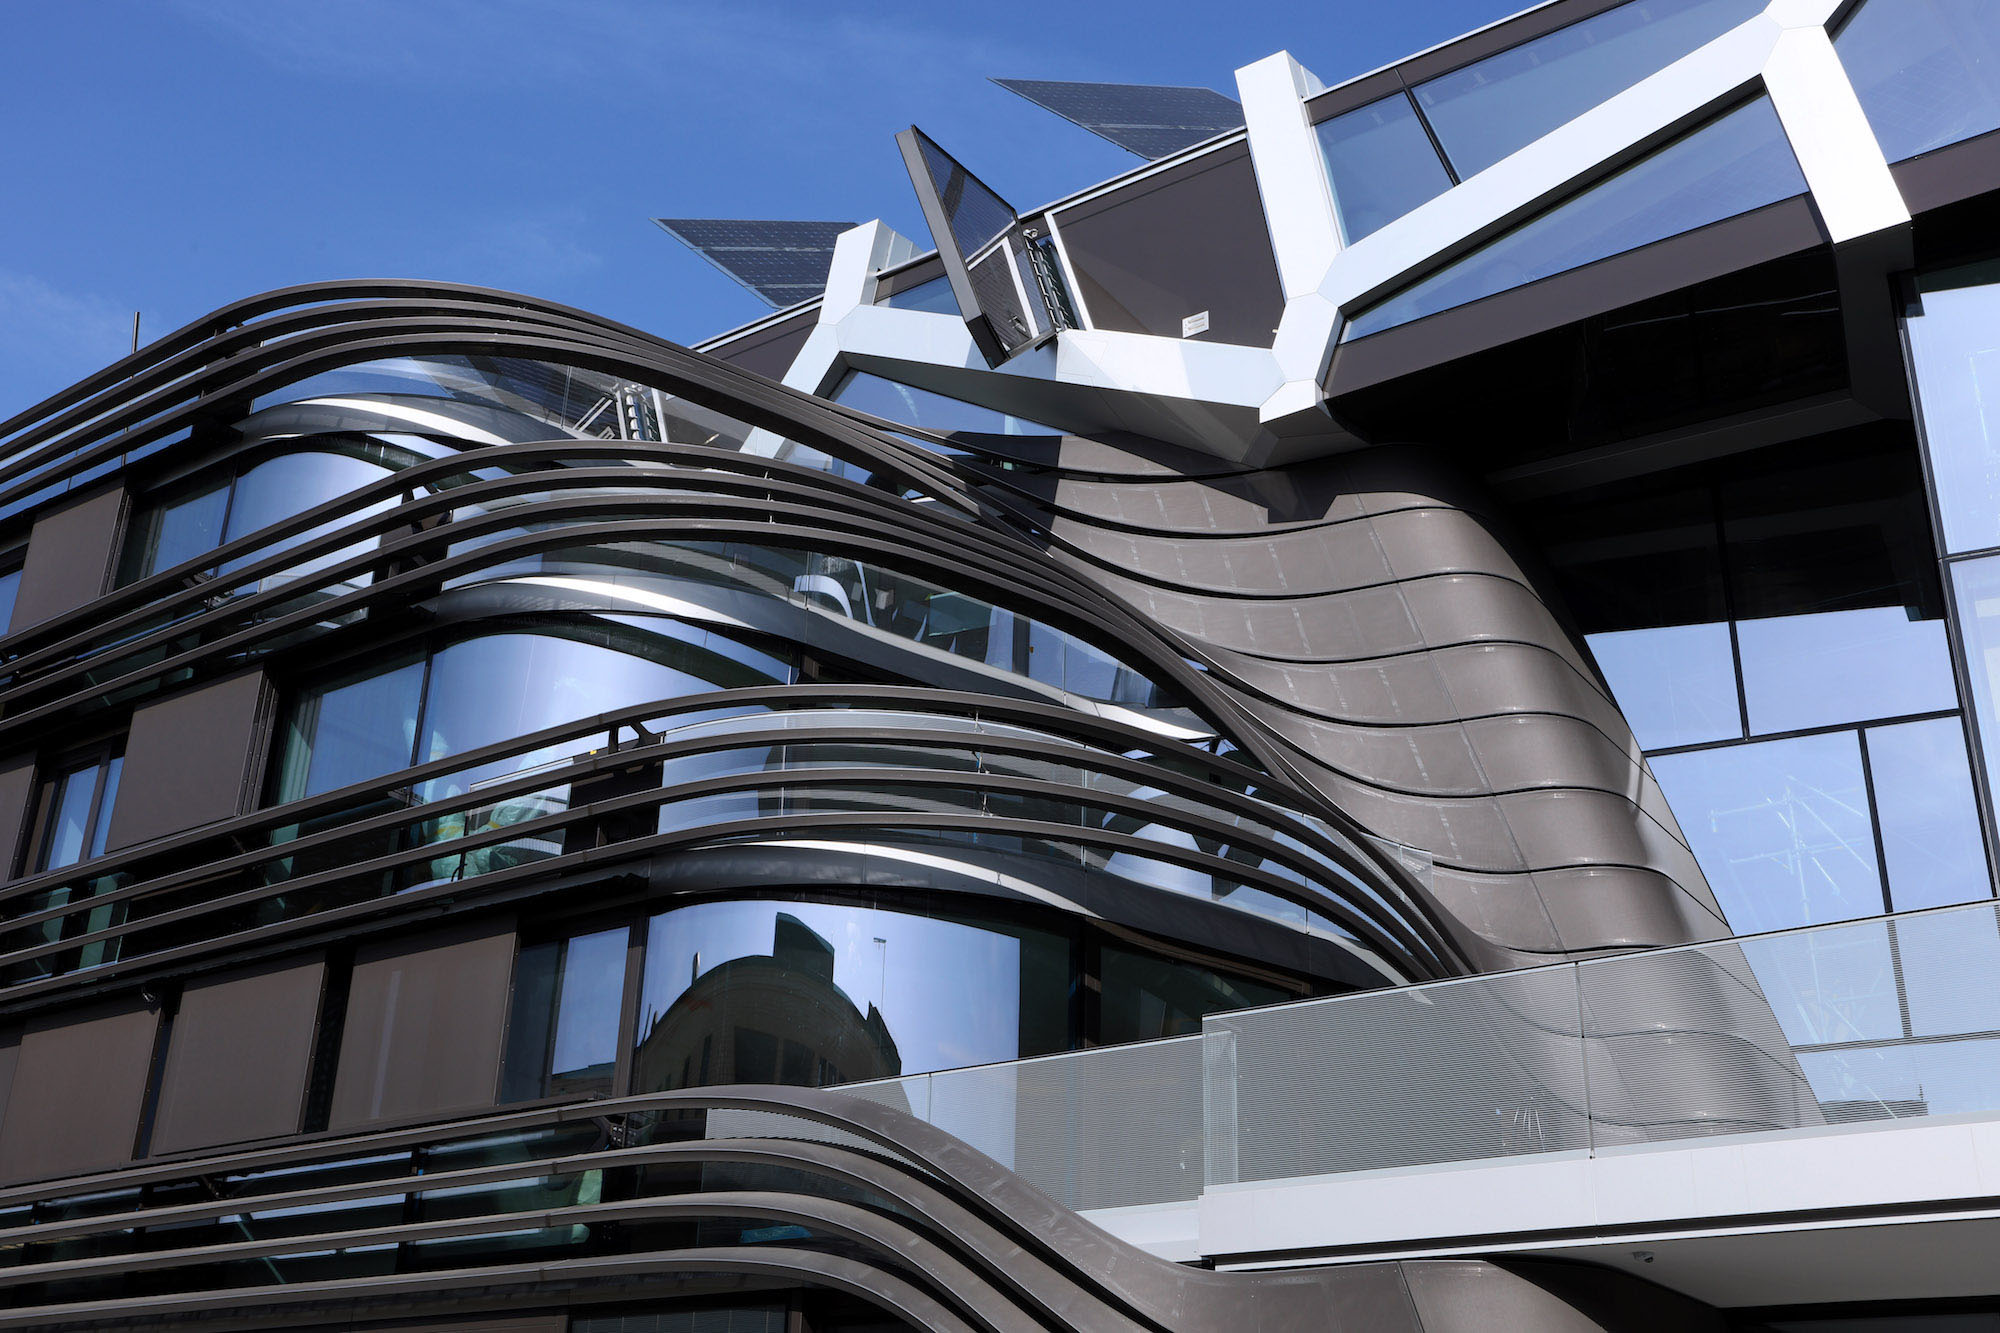 P04_falkeis.architects_a.e.b_Foto R.Korner_3C3A9503be.jpg